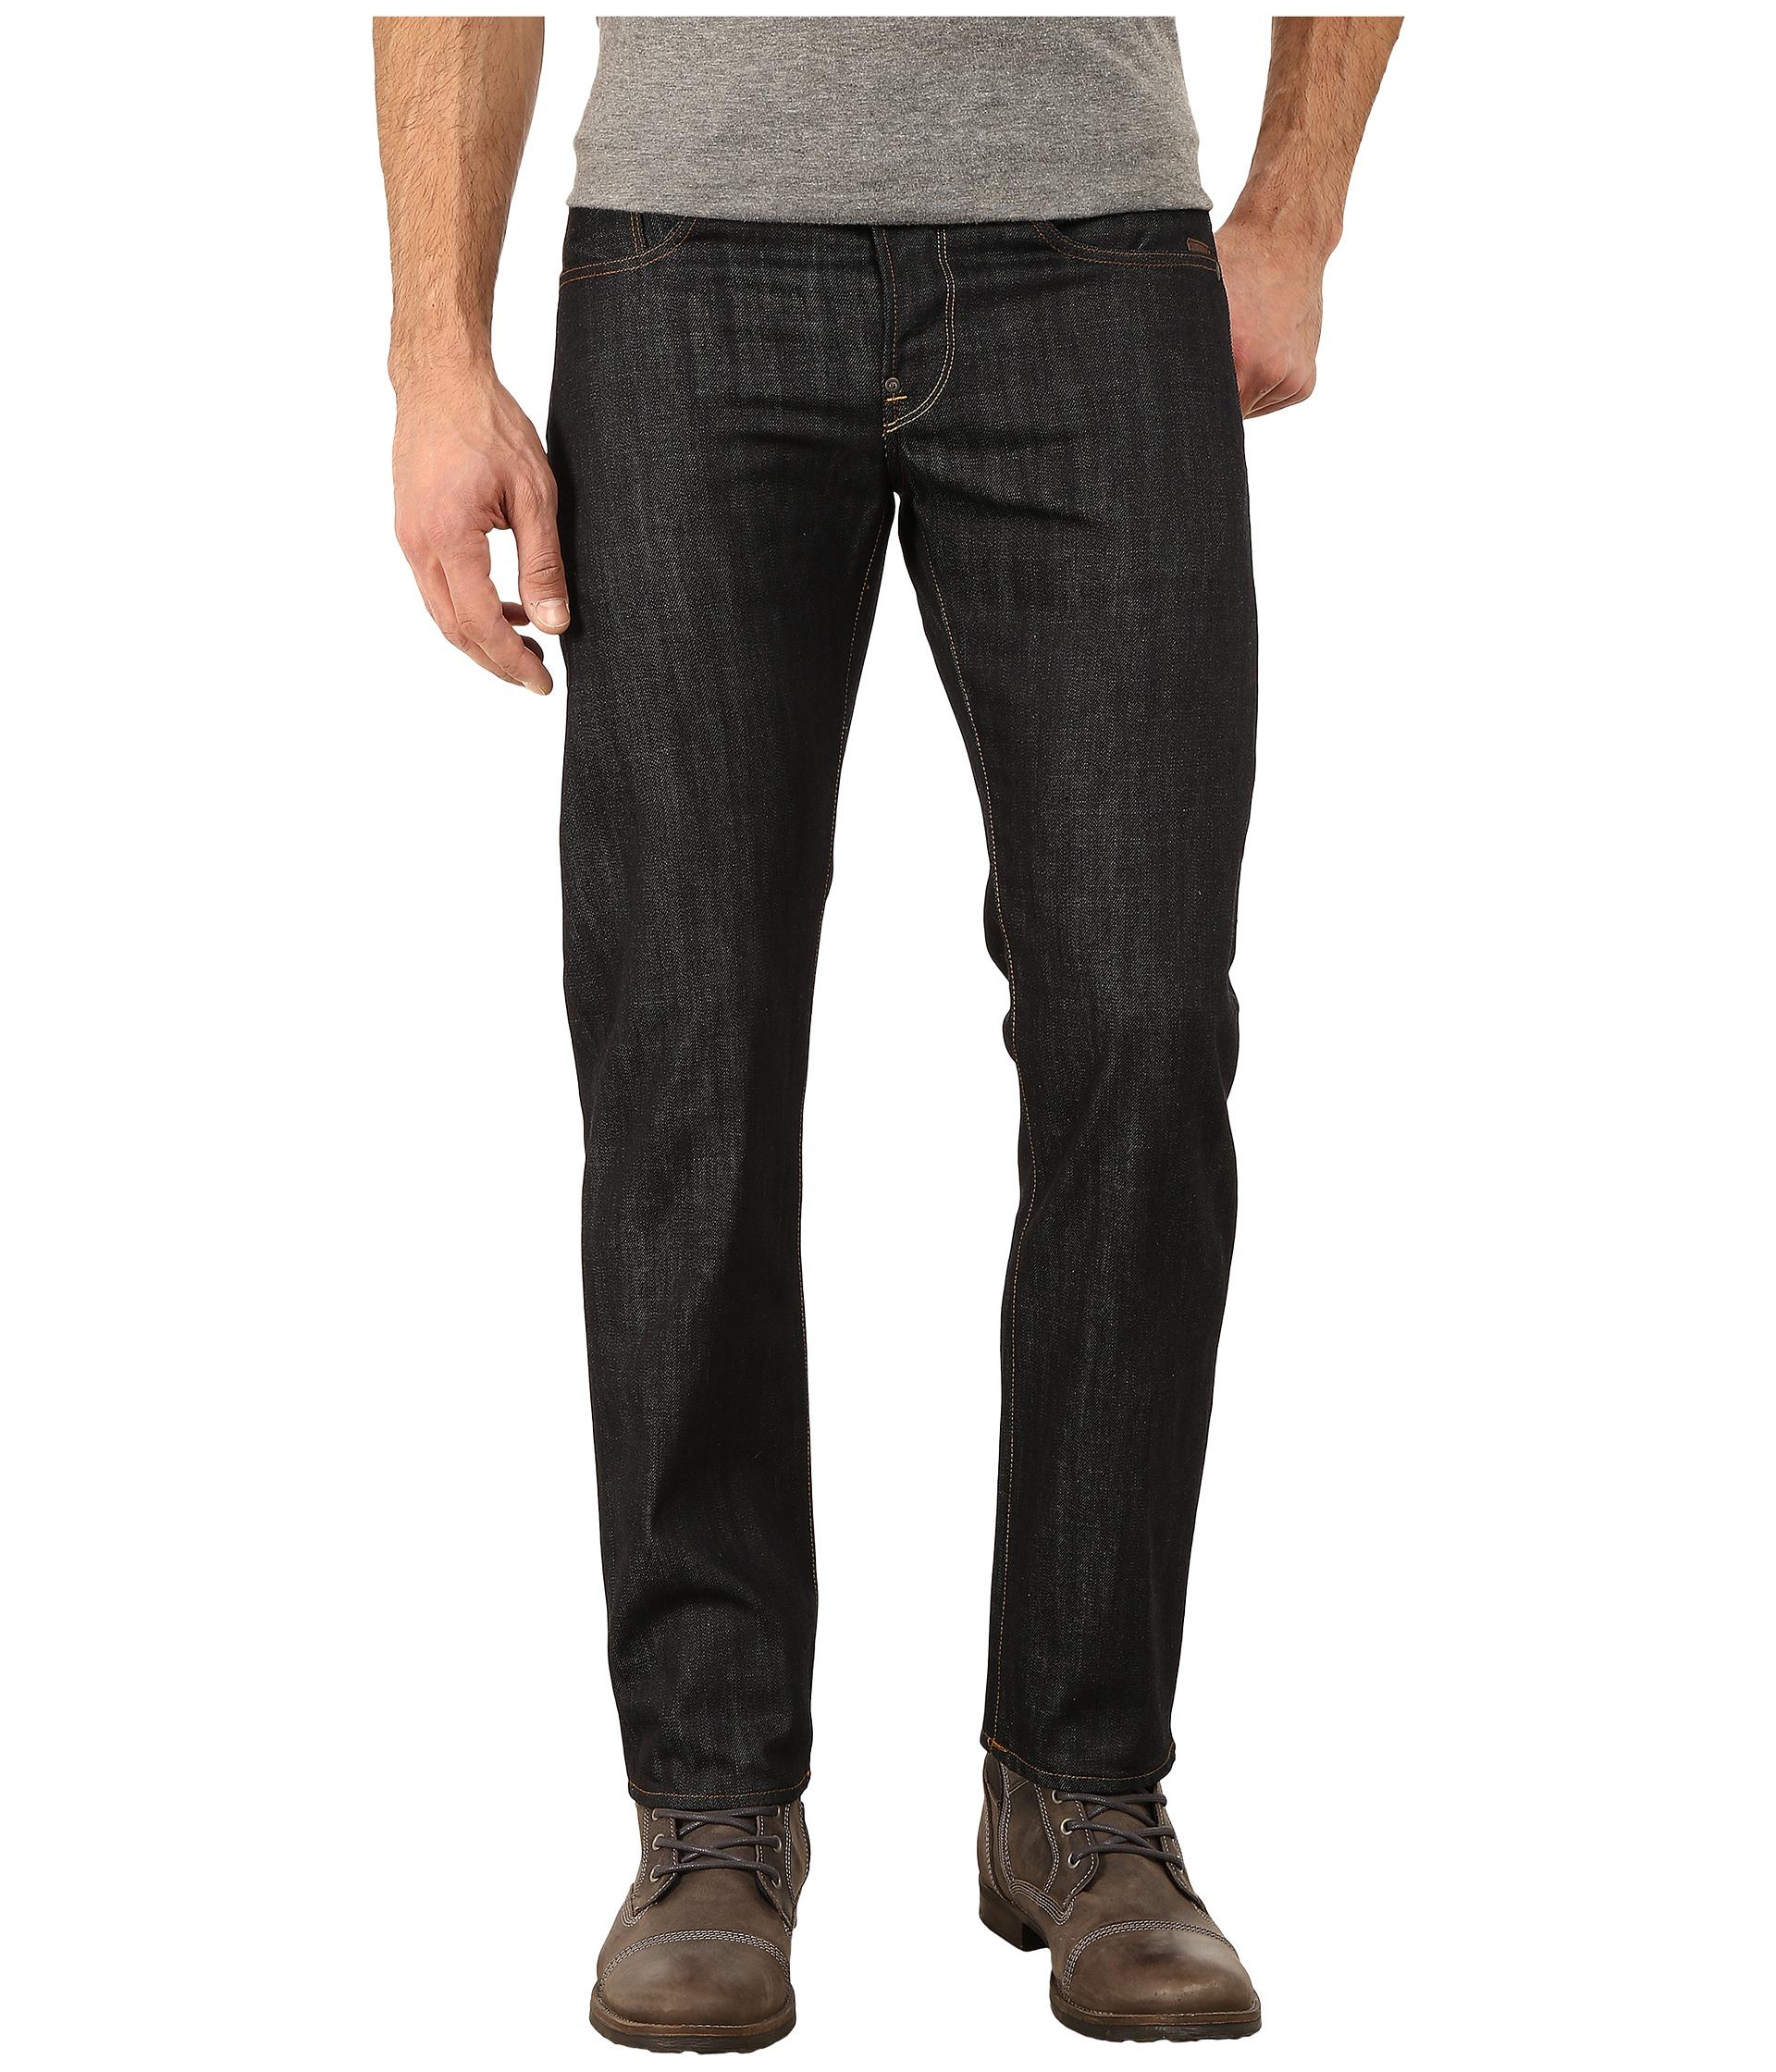 g star attacc straight fit jeans in brooklyn denim raw. Black Bedroom Furniture Sets. Home Design Ideas